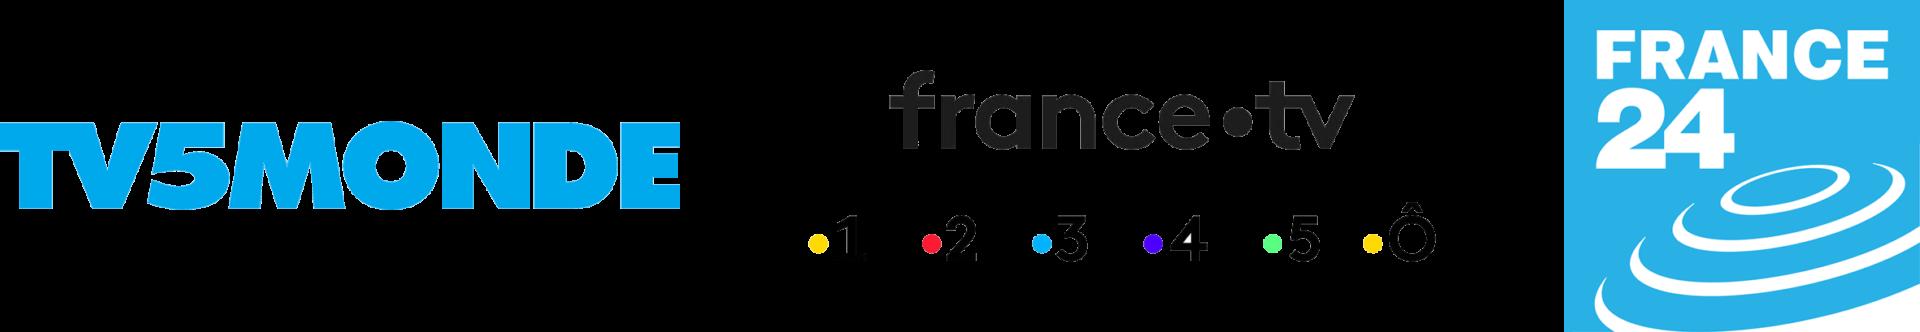 FranceTV Transfer